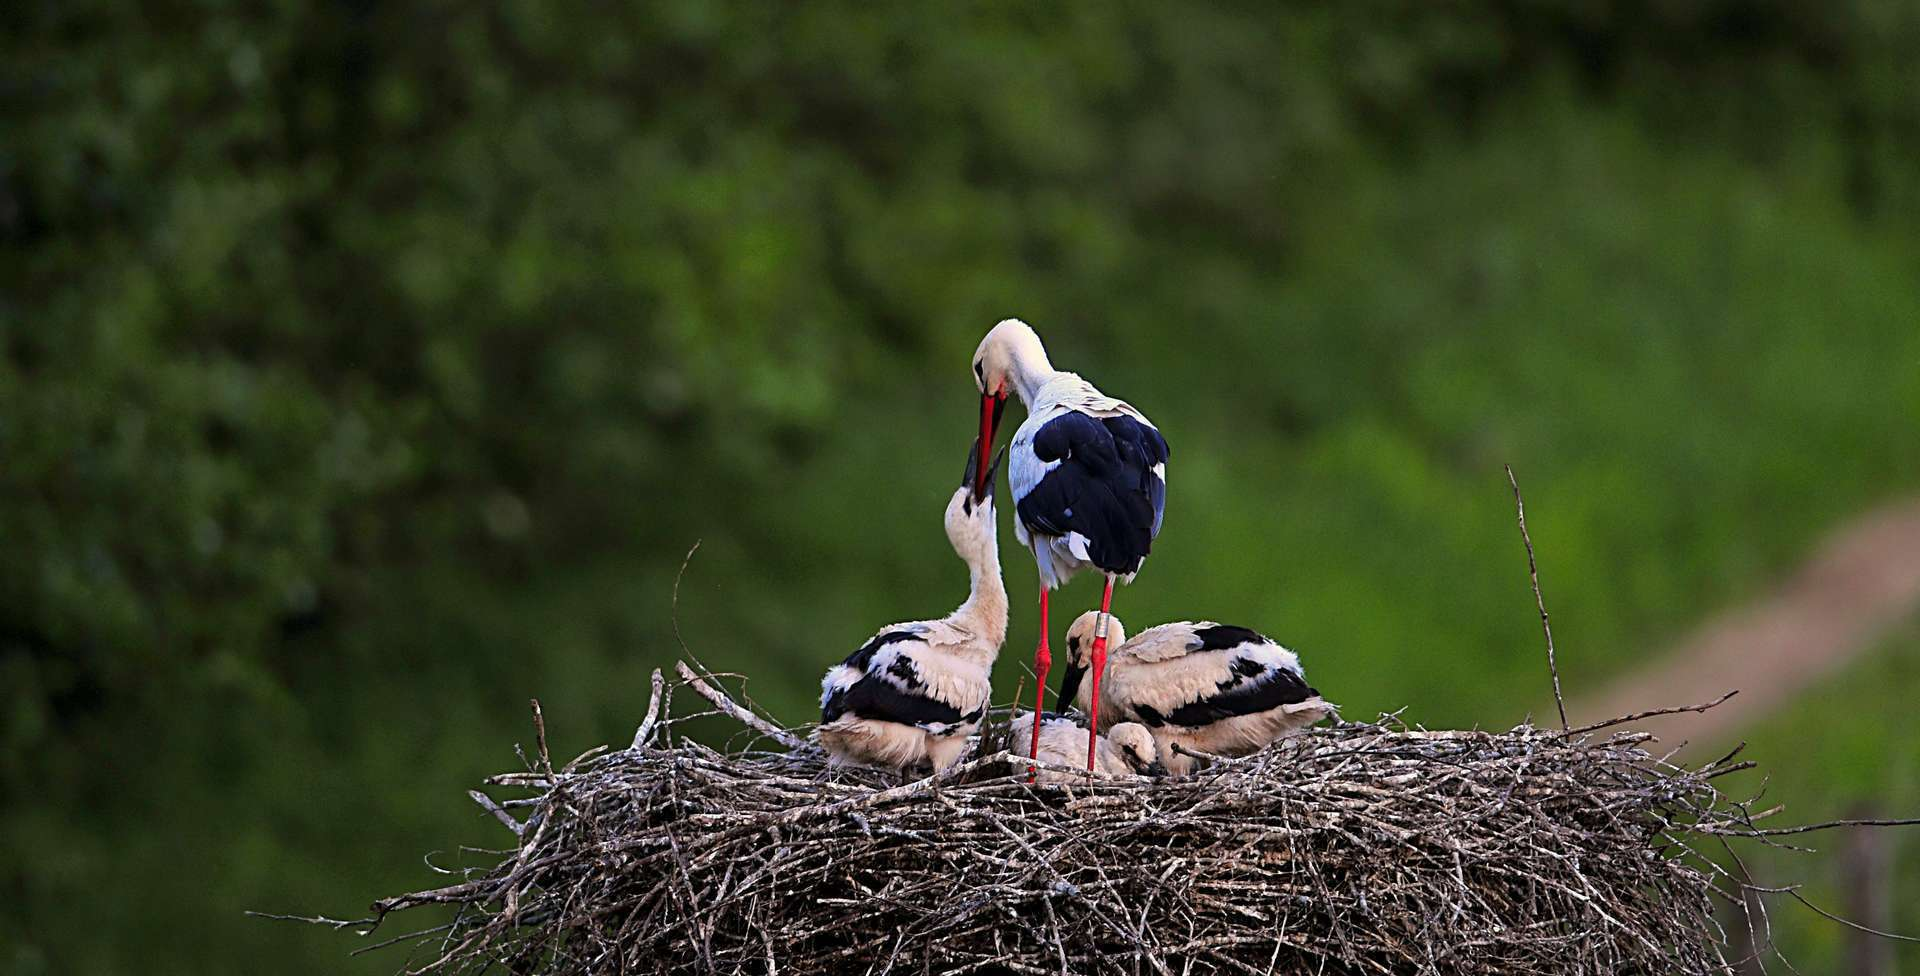 Cigogne blanche (Ciconia ciconia) adulte en train de nourrir ses petits, dans son nid